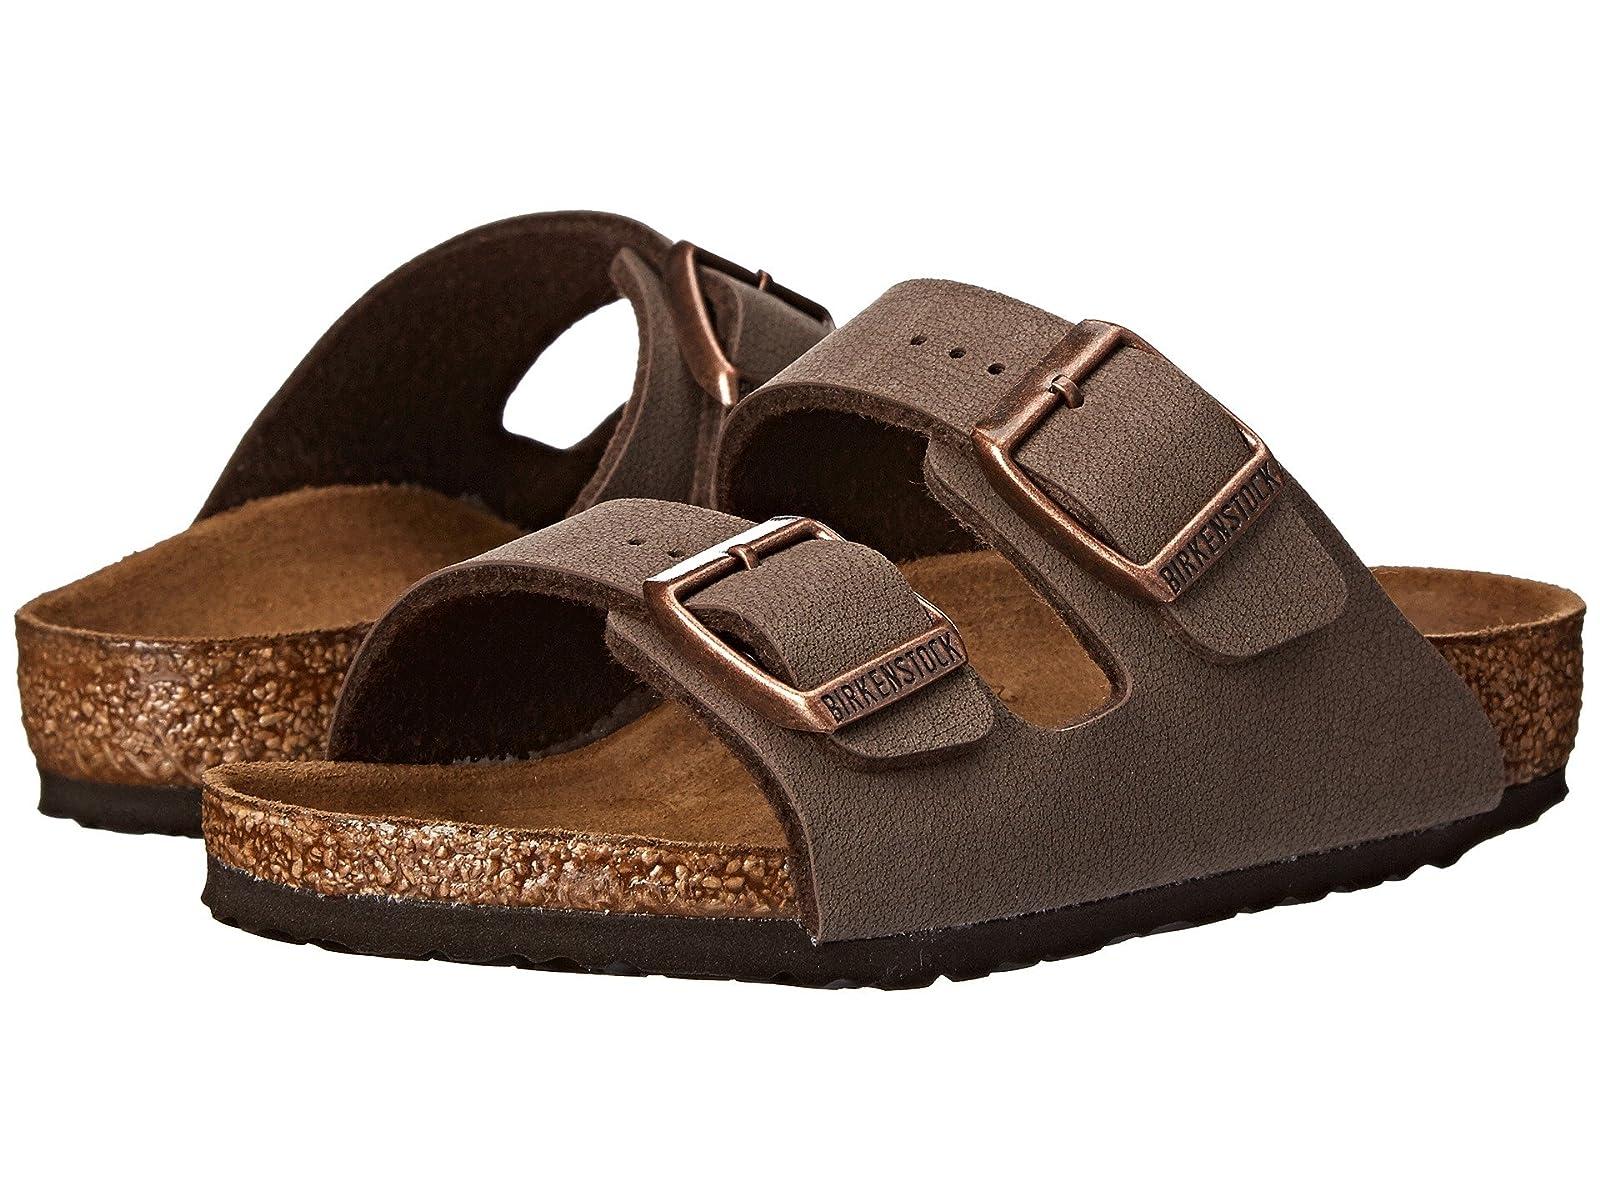 Birkenstock Kids Arizona (Toddler/Little Kid/Big Kid)Comfortable and distinctive shoes